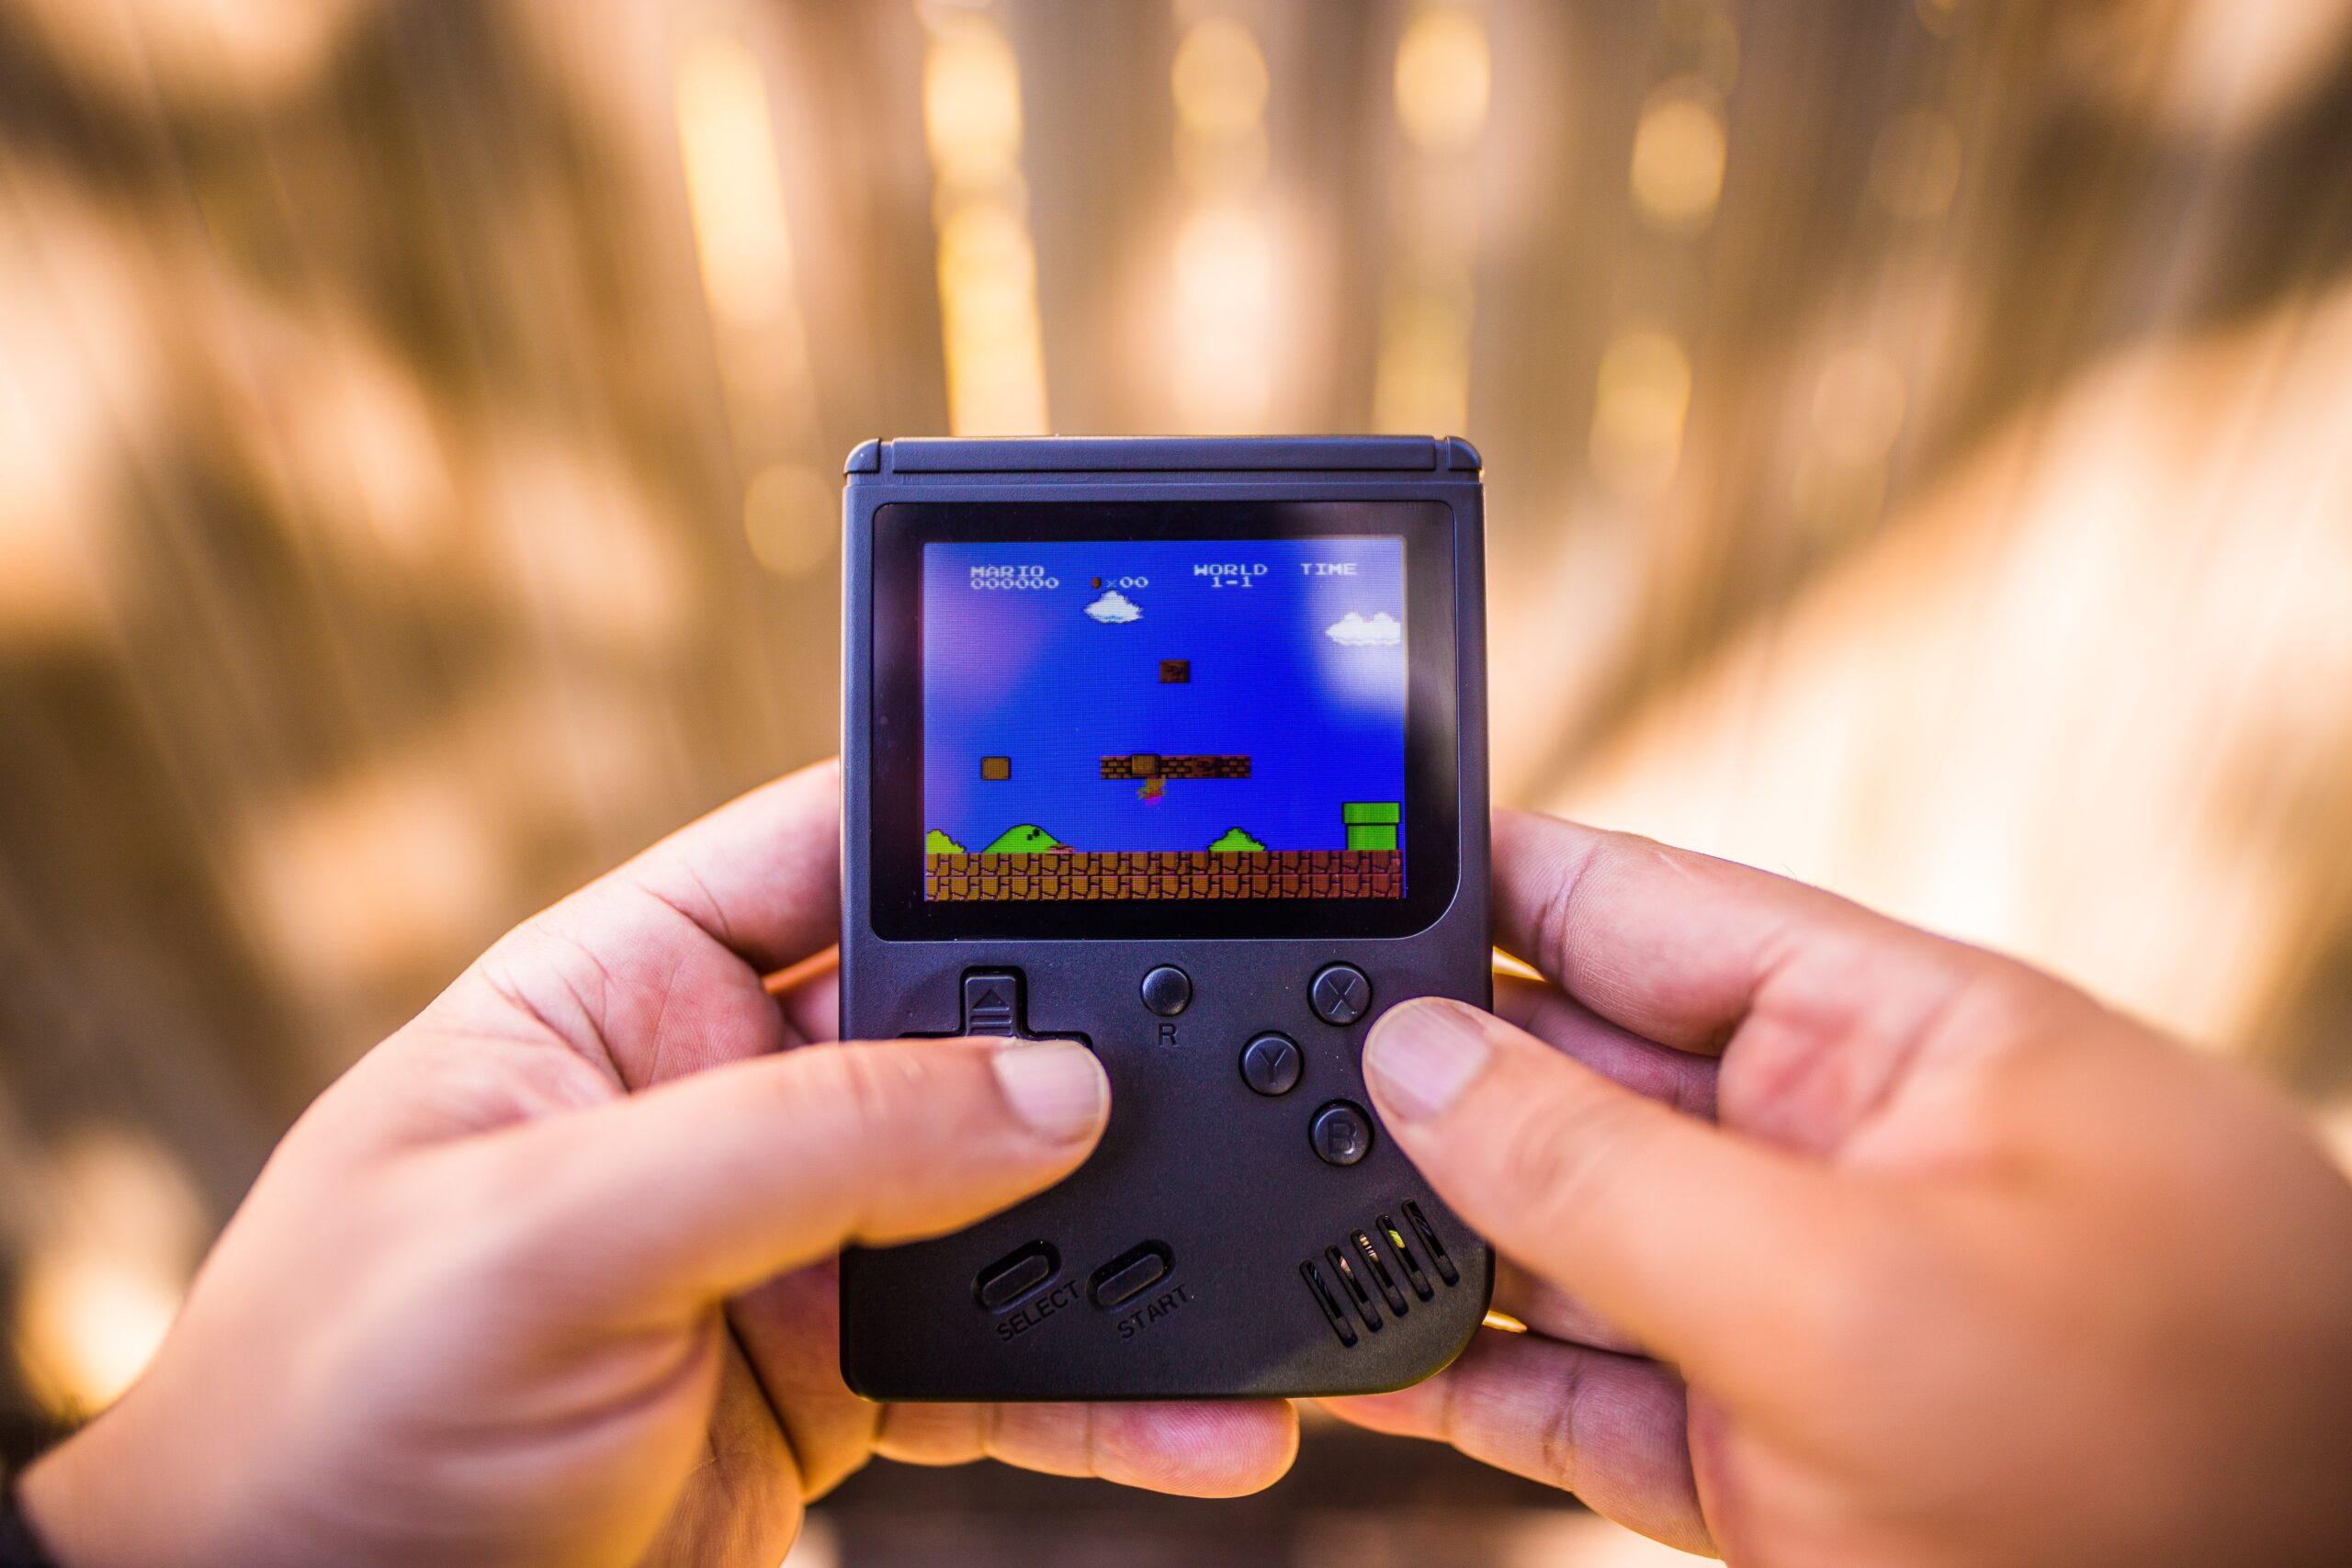 Jogar vídeo game te deixa mais inteligente